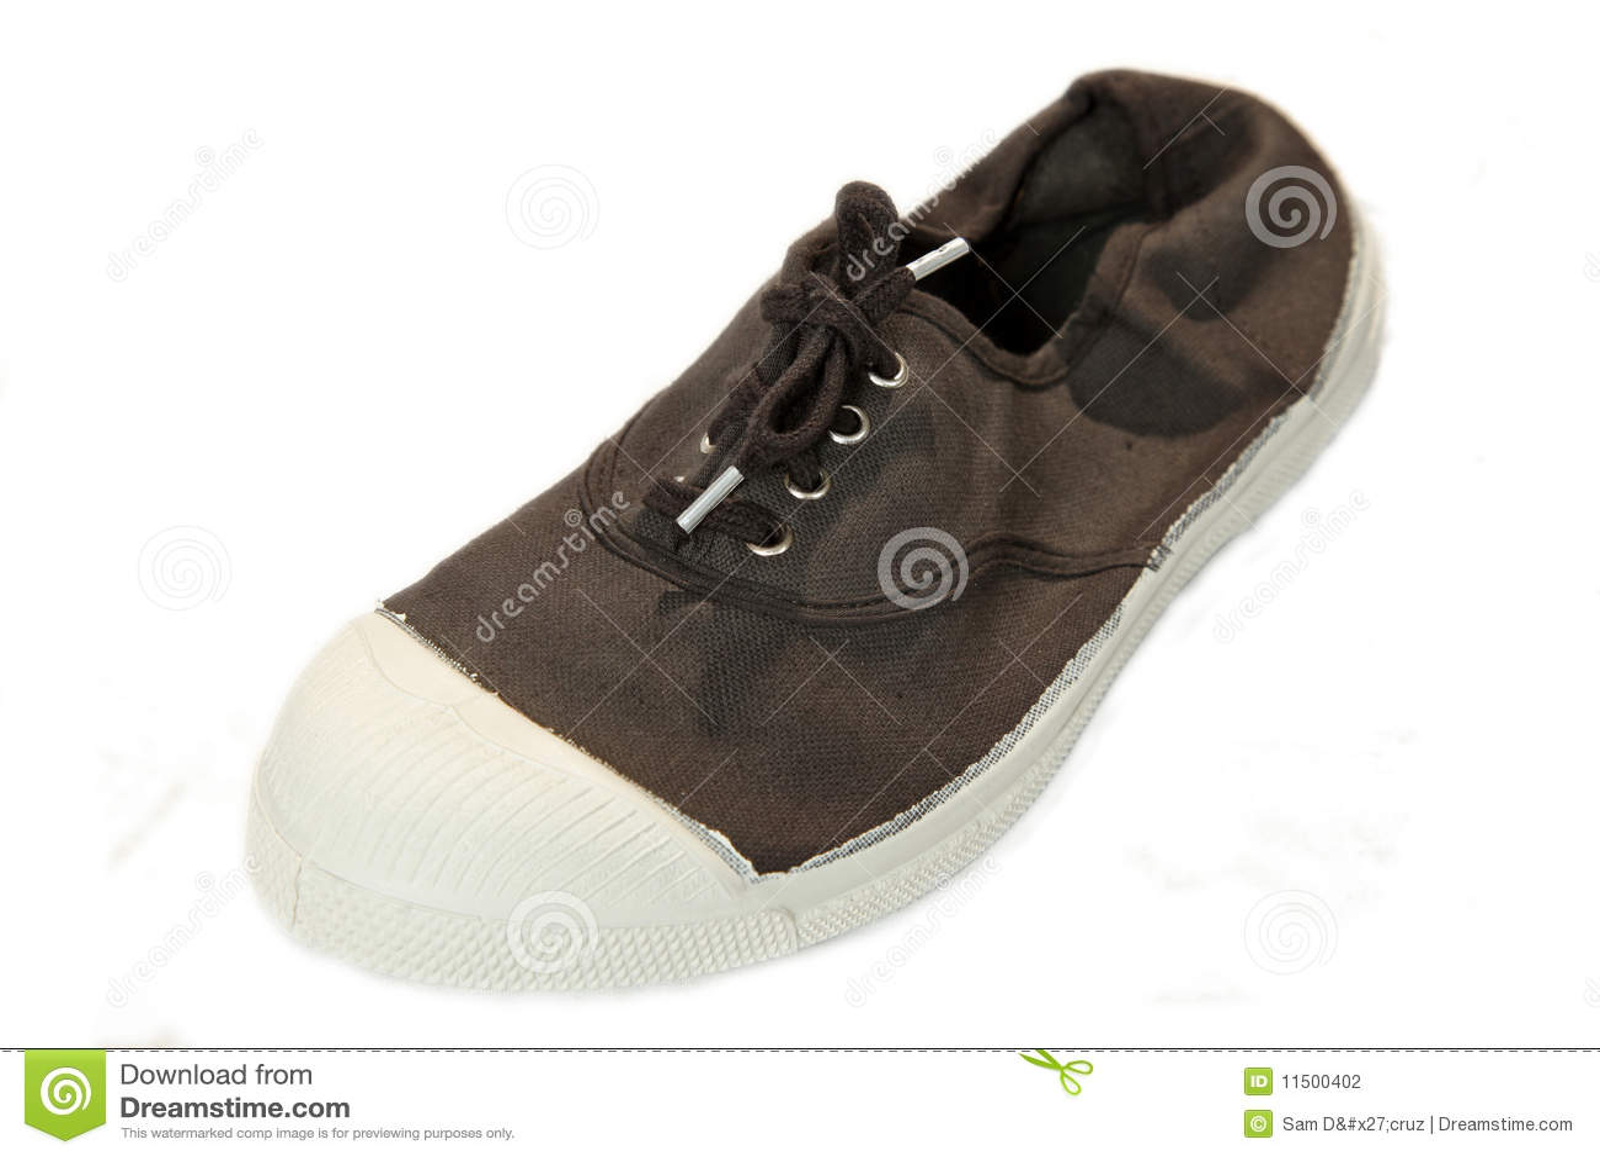 3039da570b4 περιστασιακά παπούτσια γ στοκ εικόνες. εικόνα από accidence - 11500402